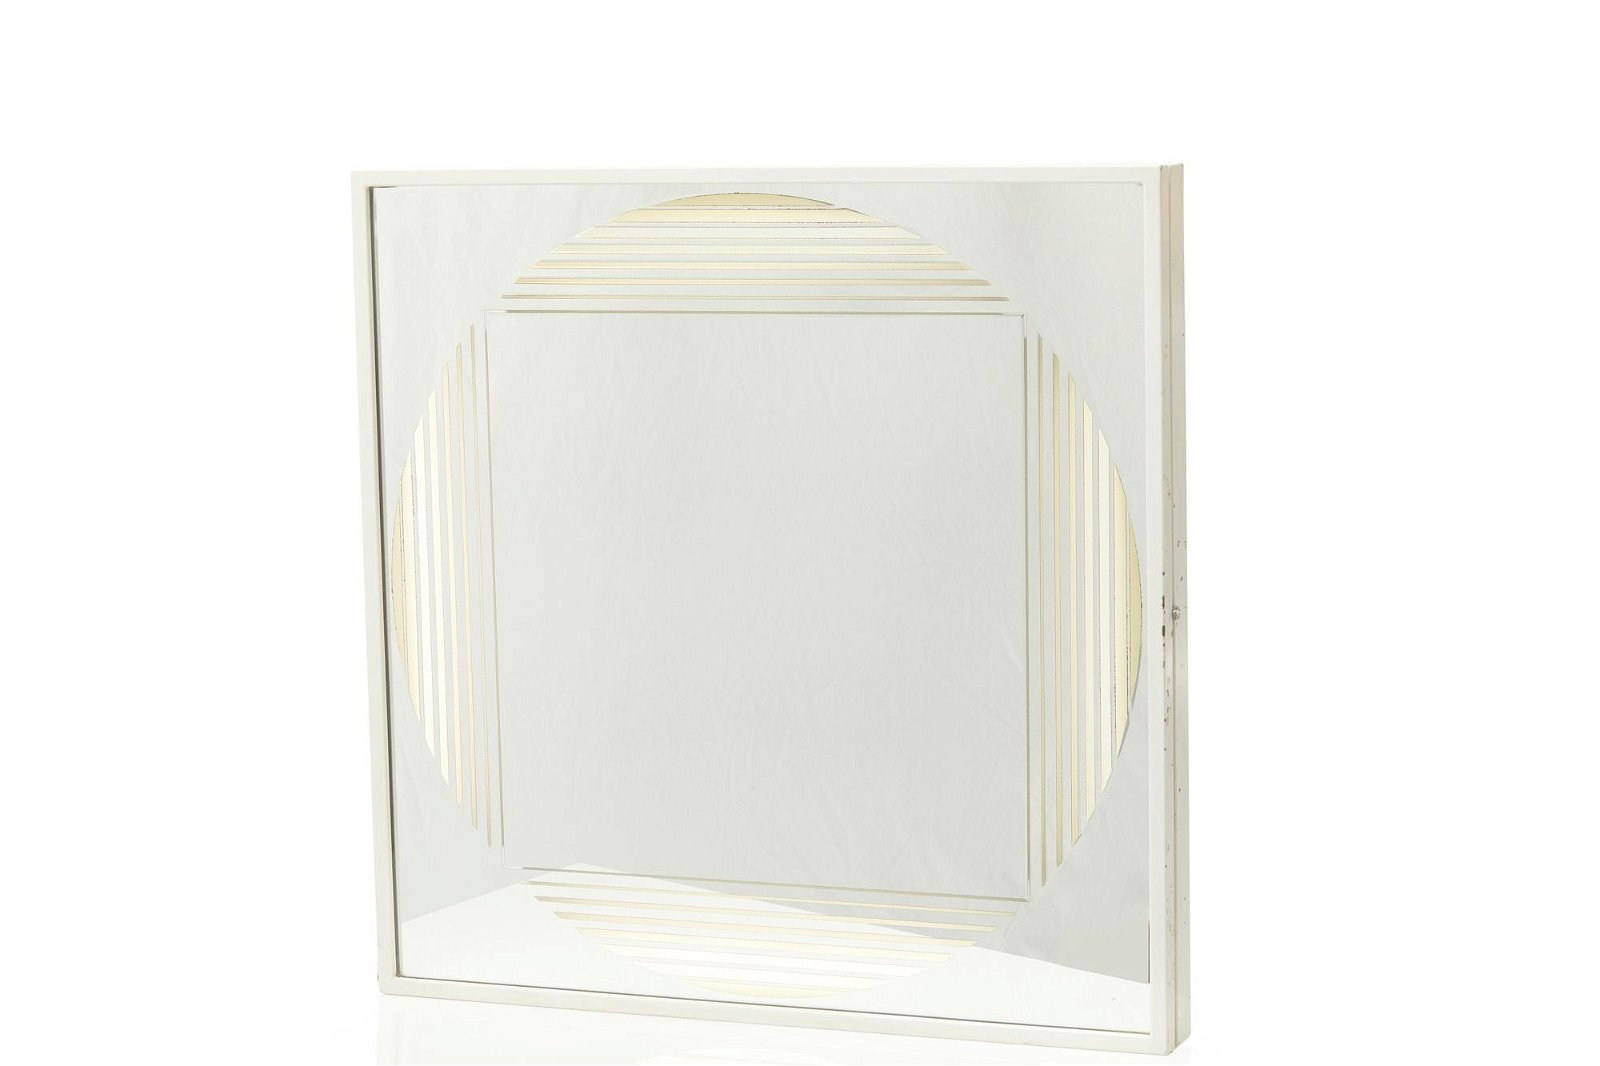 "Gianni Celada, ""Brama"" mirror for Fontana"